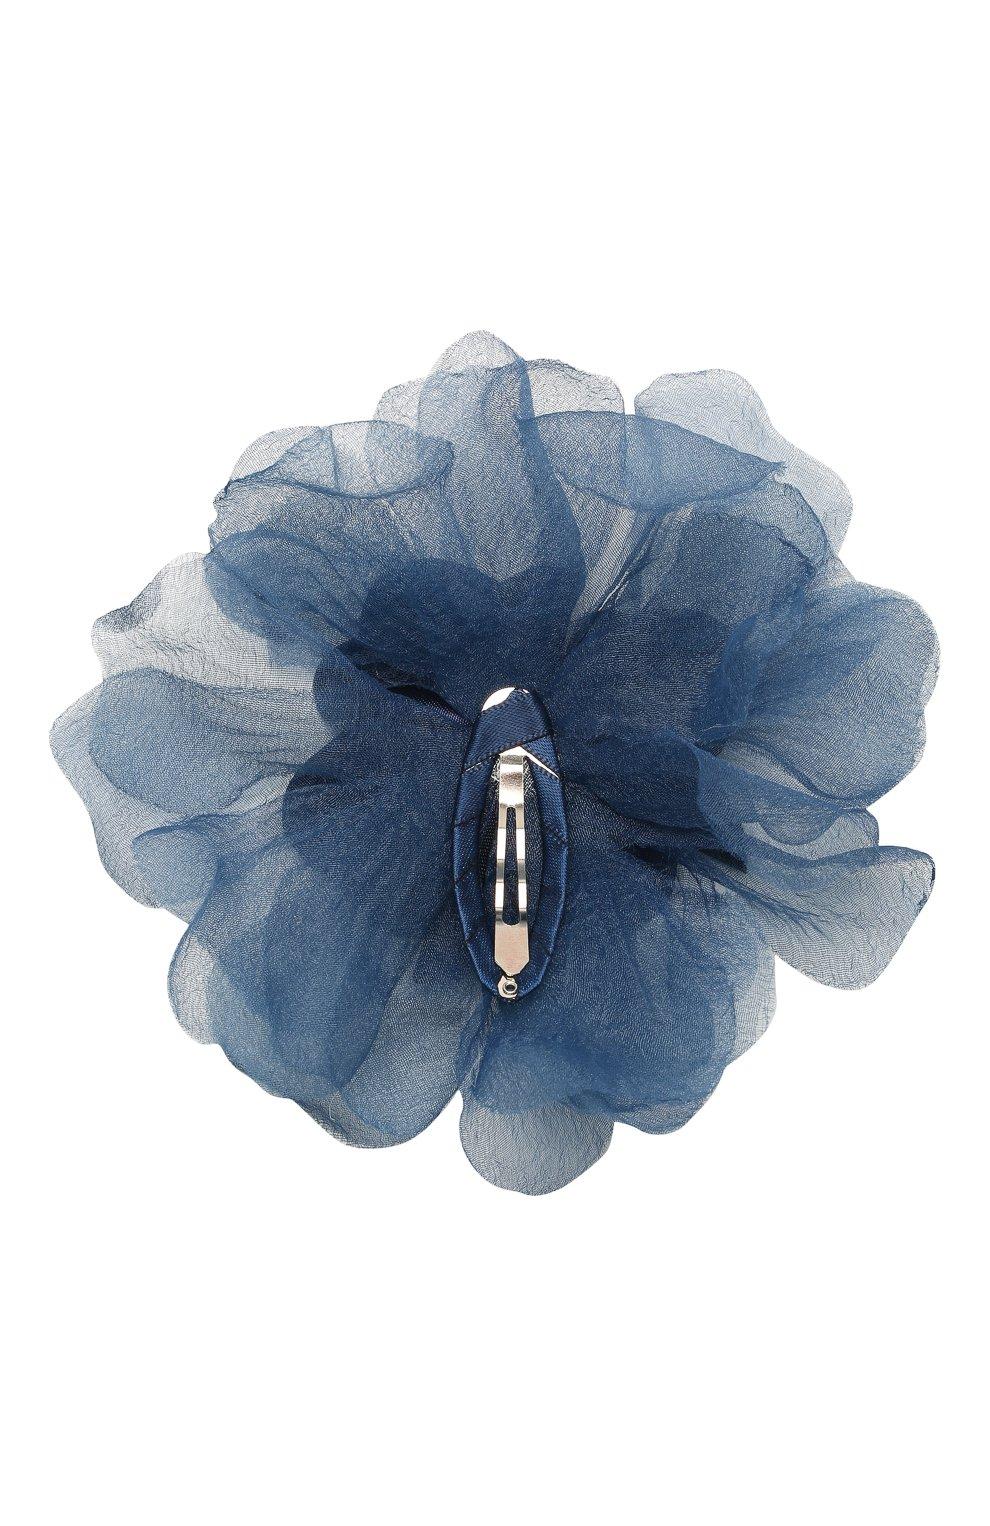 Детская заколка tenderness JUNEFEE синего цвета, арт. 5871   Фото 2